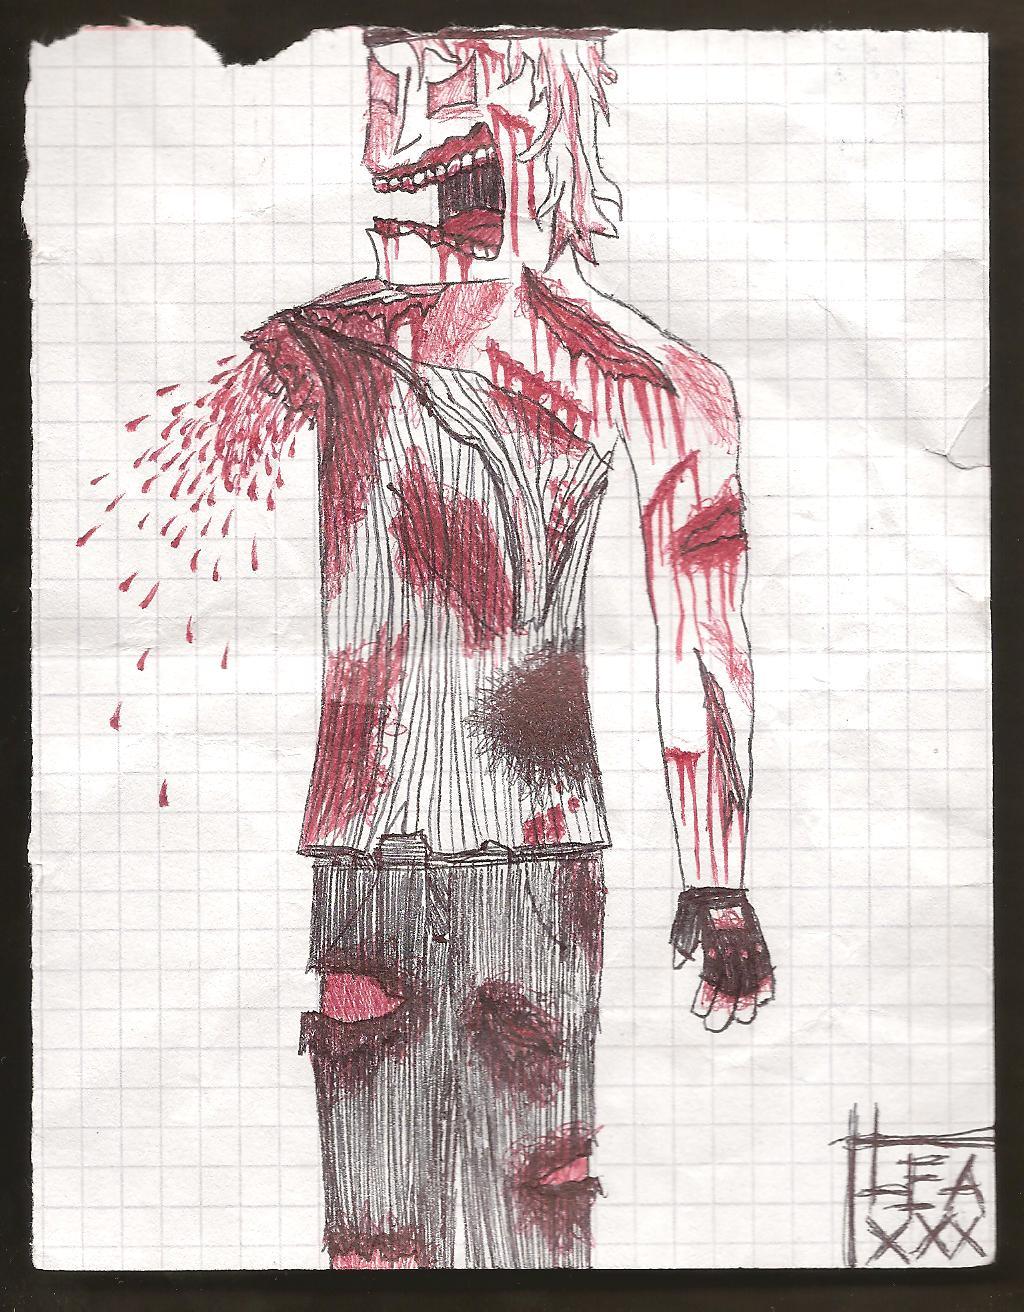 DEADPHOBIA 9